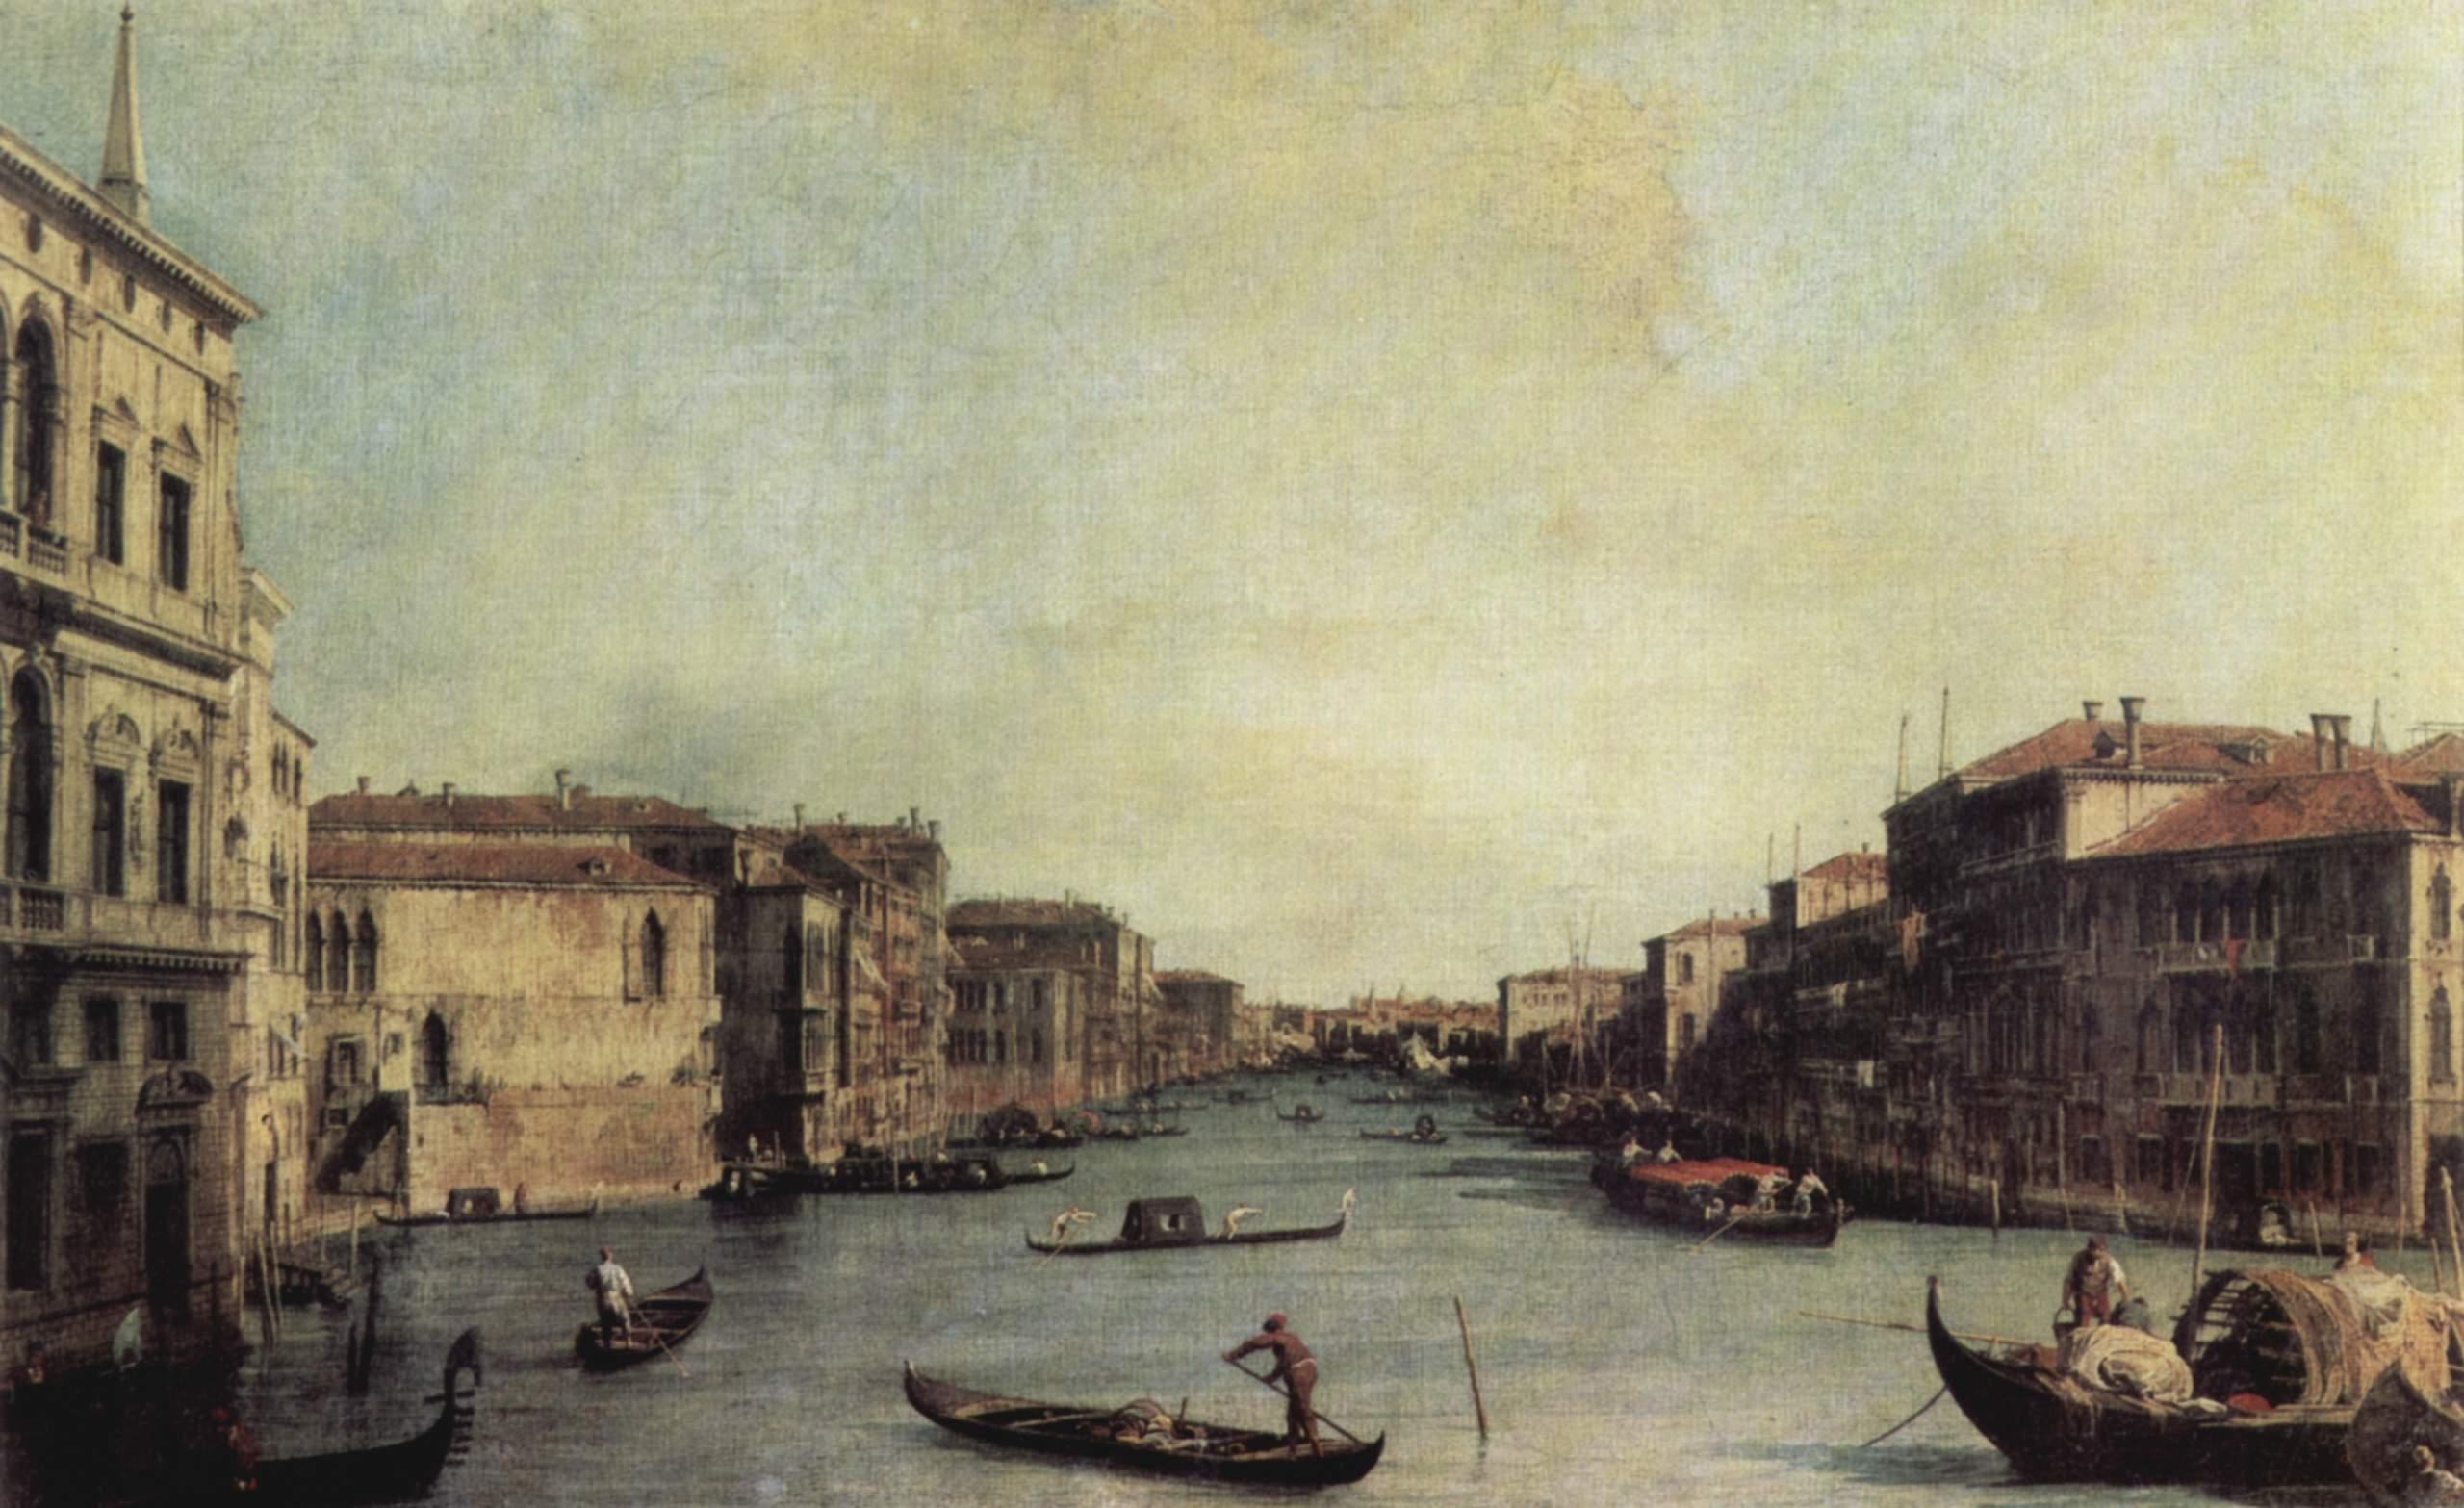 Ll Canal Grande (Большой канал), Антонио Каналетто 2